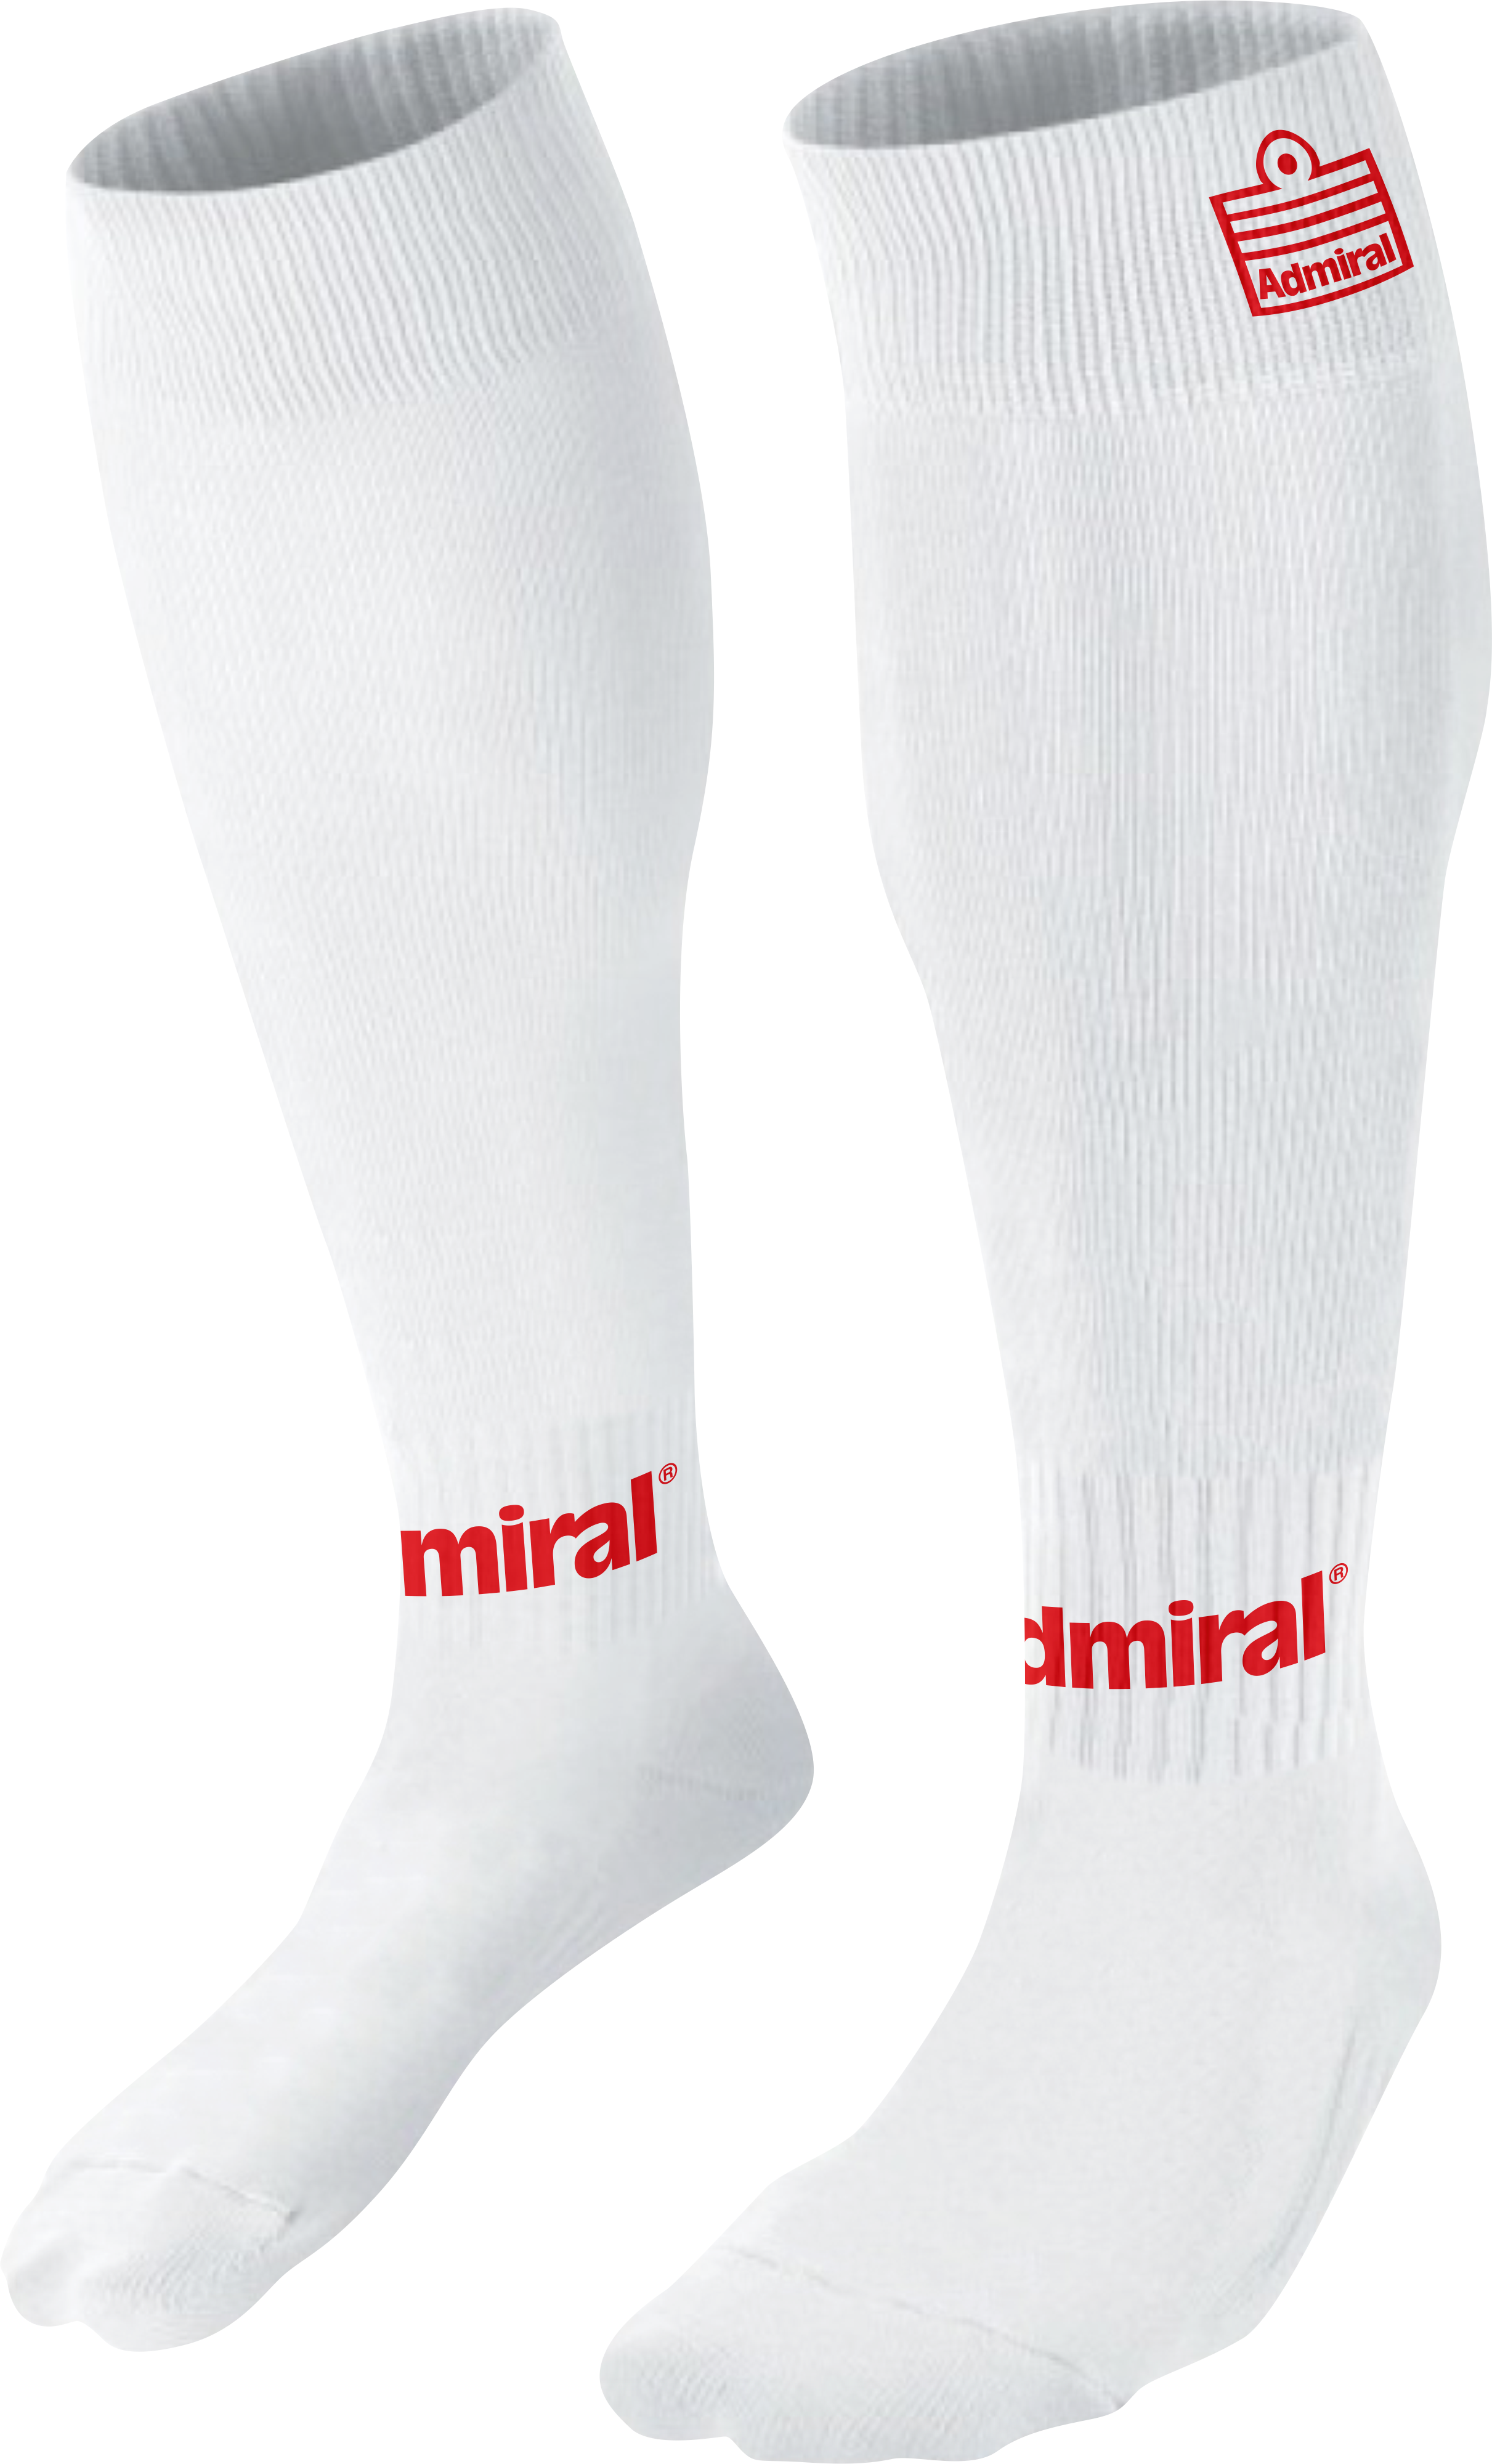 ADMIRAL Professional Socks